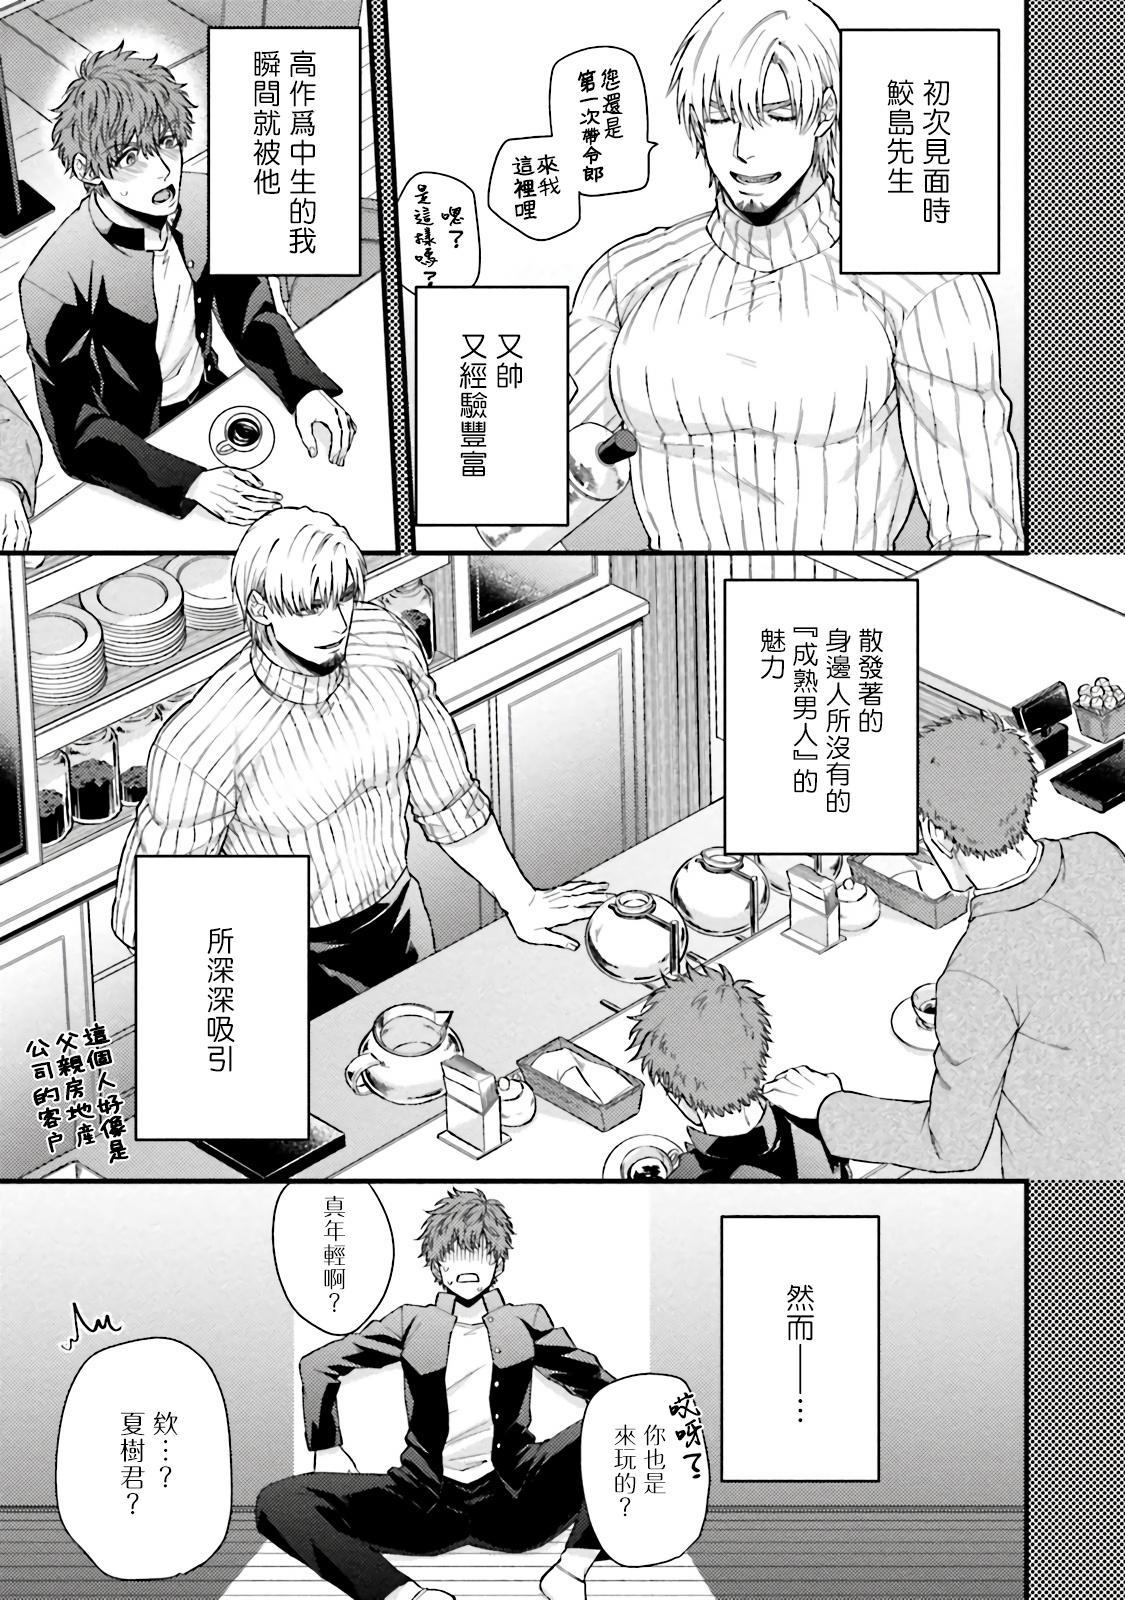 Kinou wa Otanoshimi Deshita ne | 昨天过得很愉快吧 Ch. 1-4+特典 8